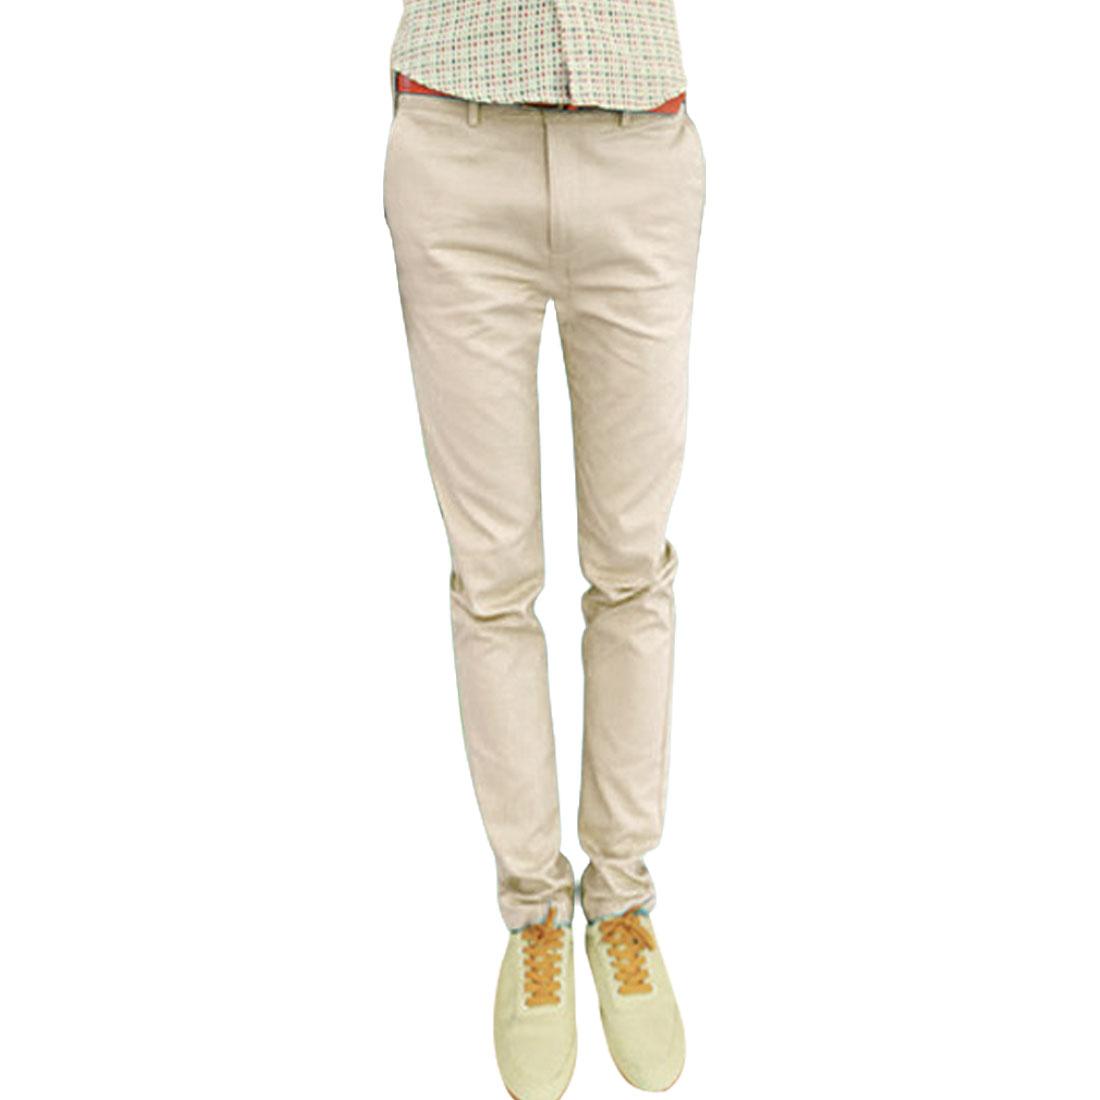 Men Waistband Loop Zip Closure Hip Pockets Casual Pants Beige W32